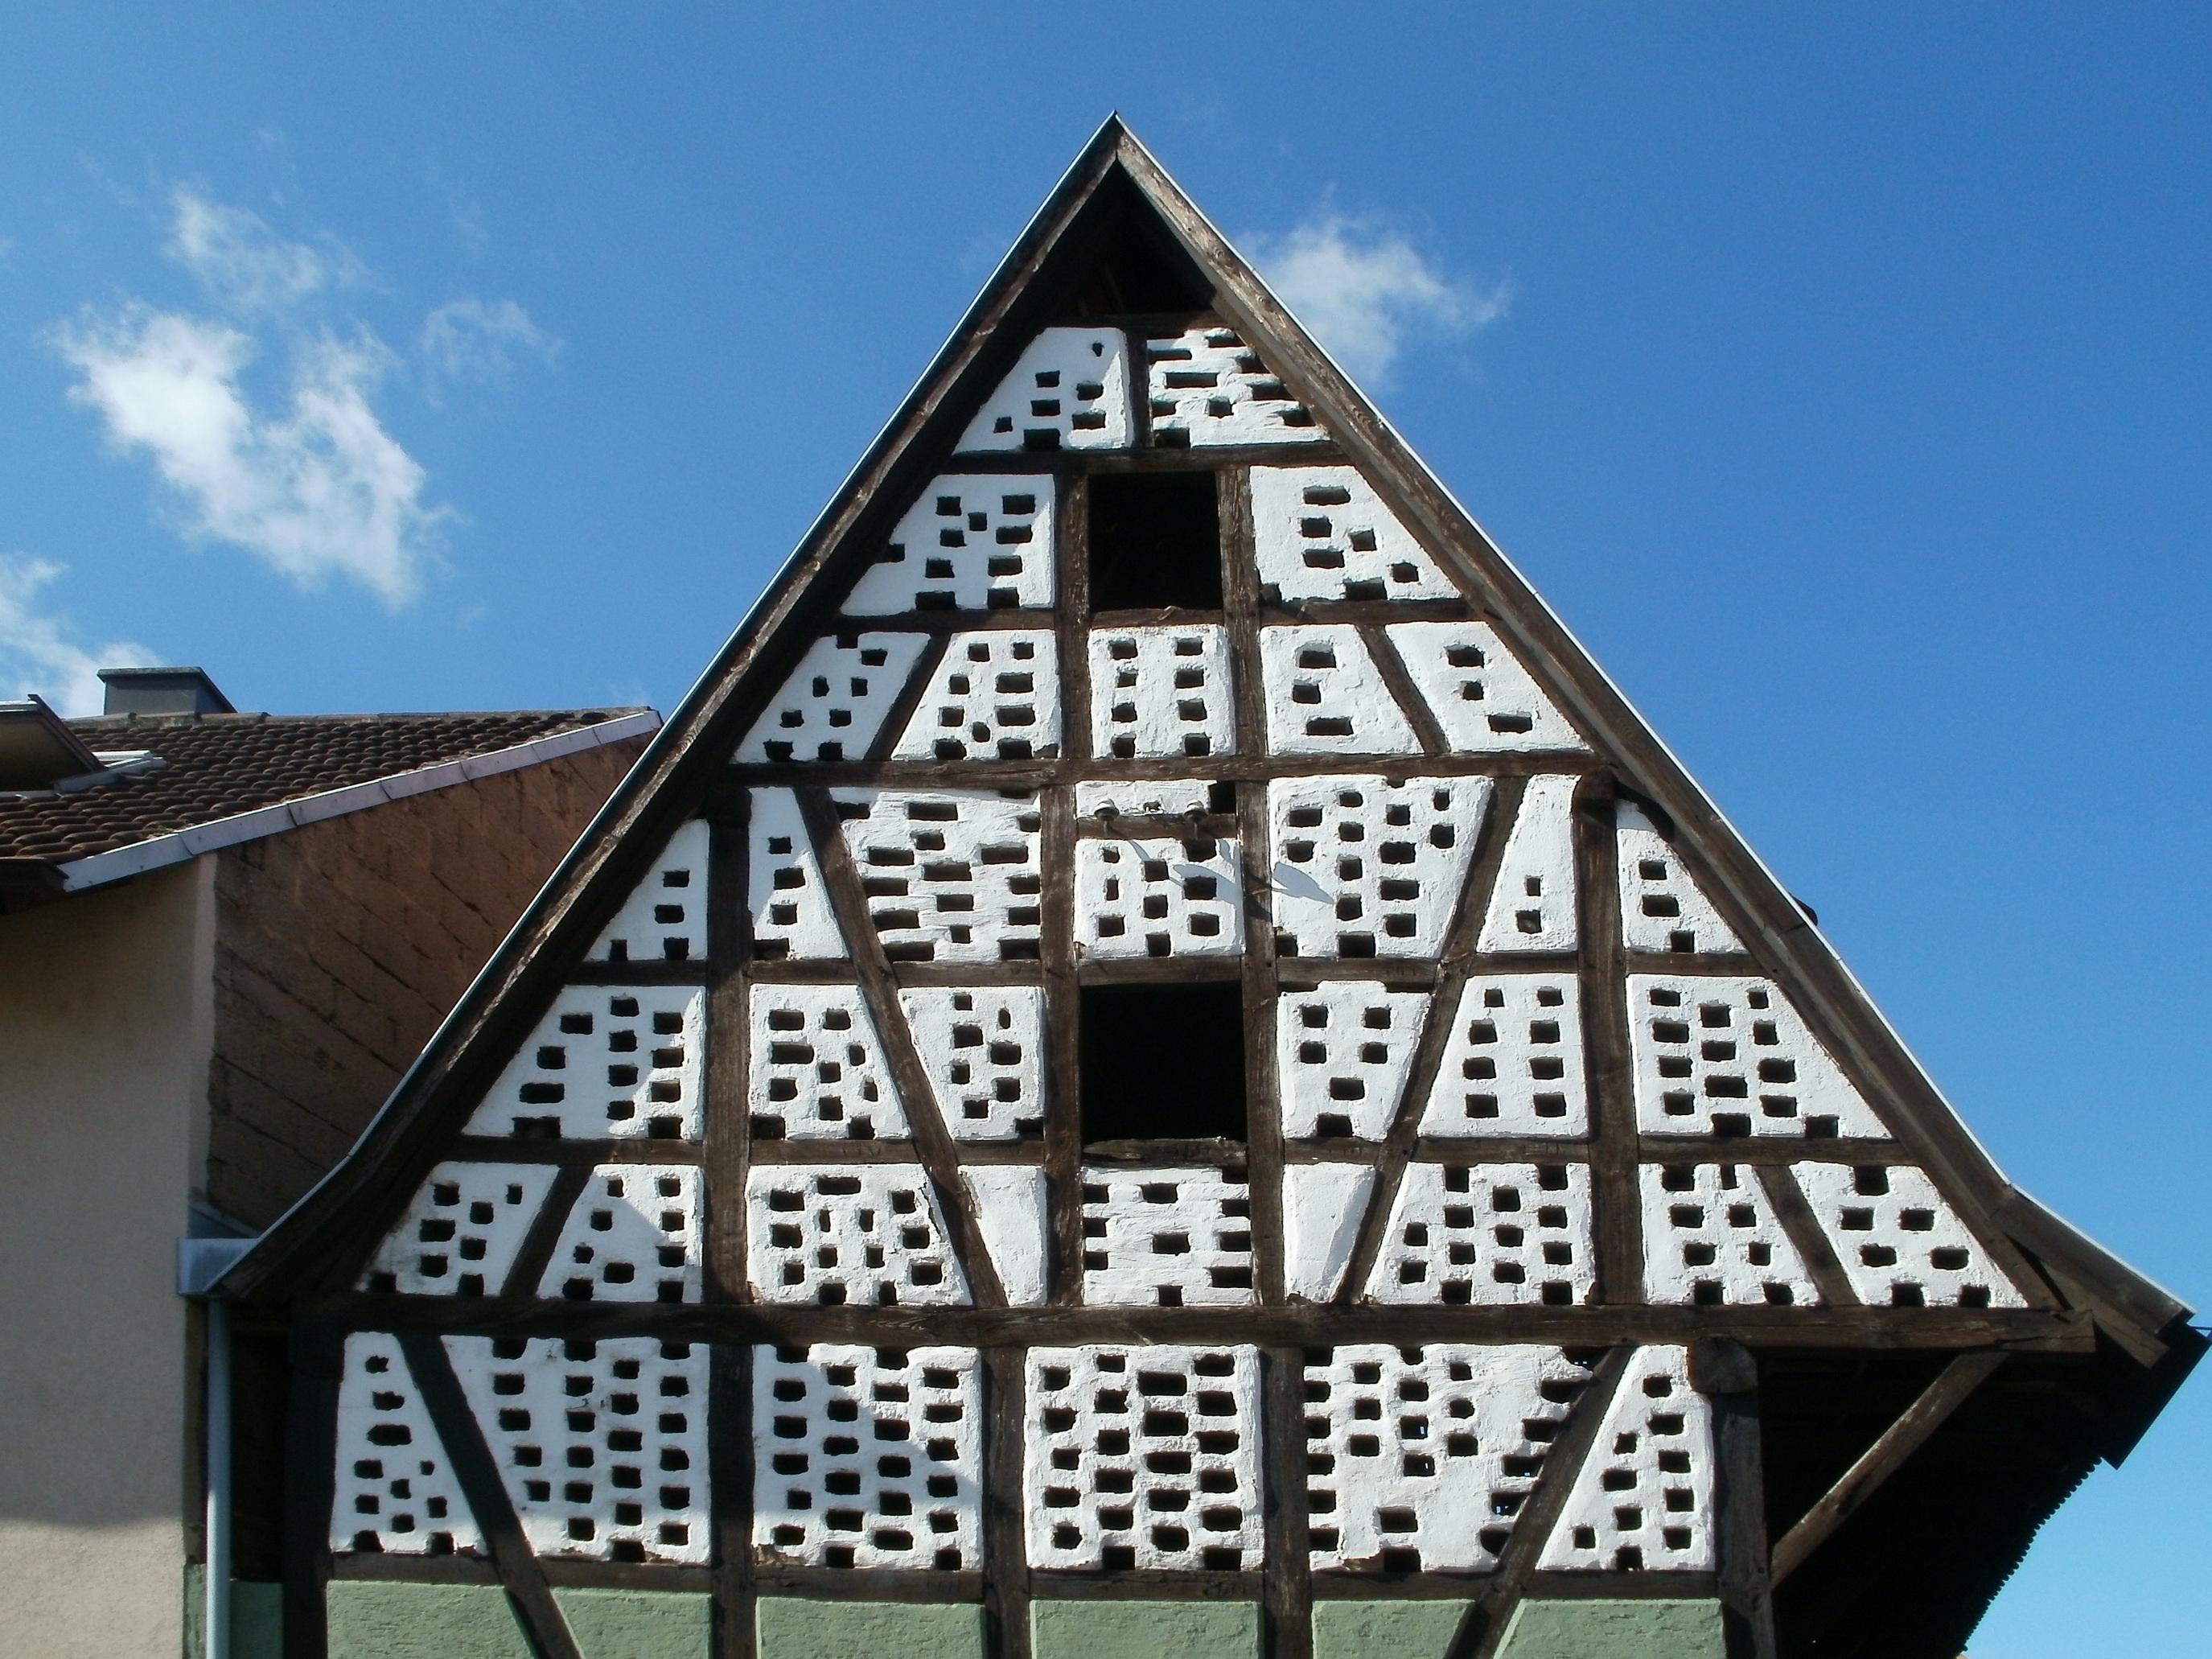 Fotos gratis : arquitectura, estructura, casa, techo, edificio ...